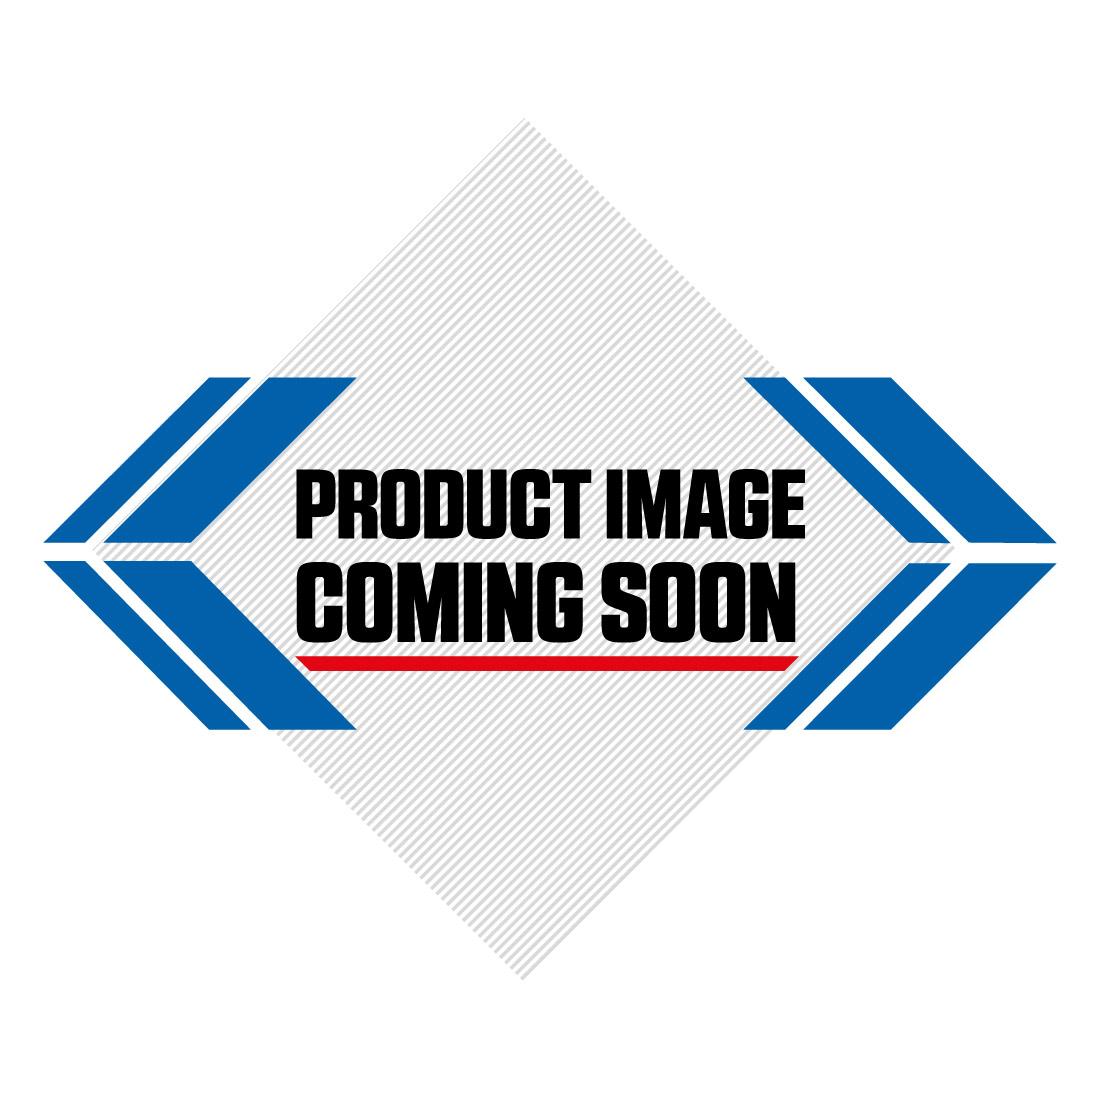 Suzuki Plastic Kit RMZ 450 (08-17) Black Image-2>